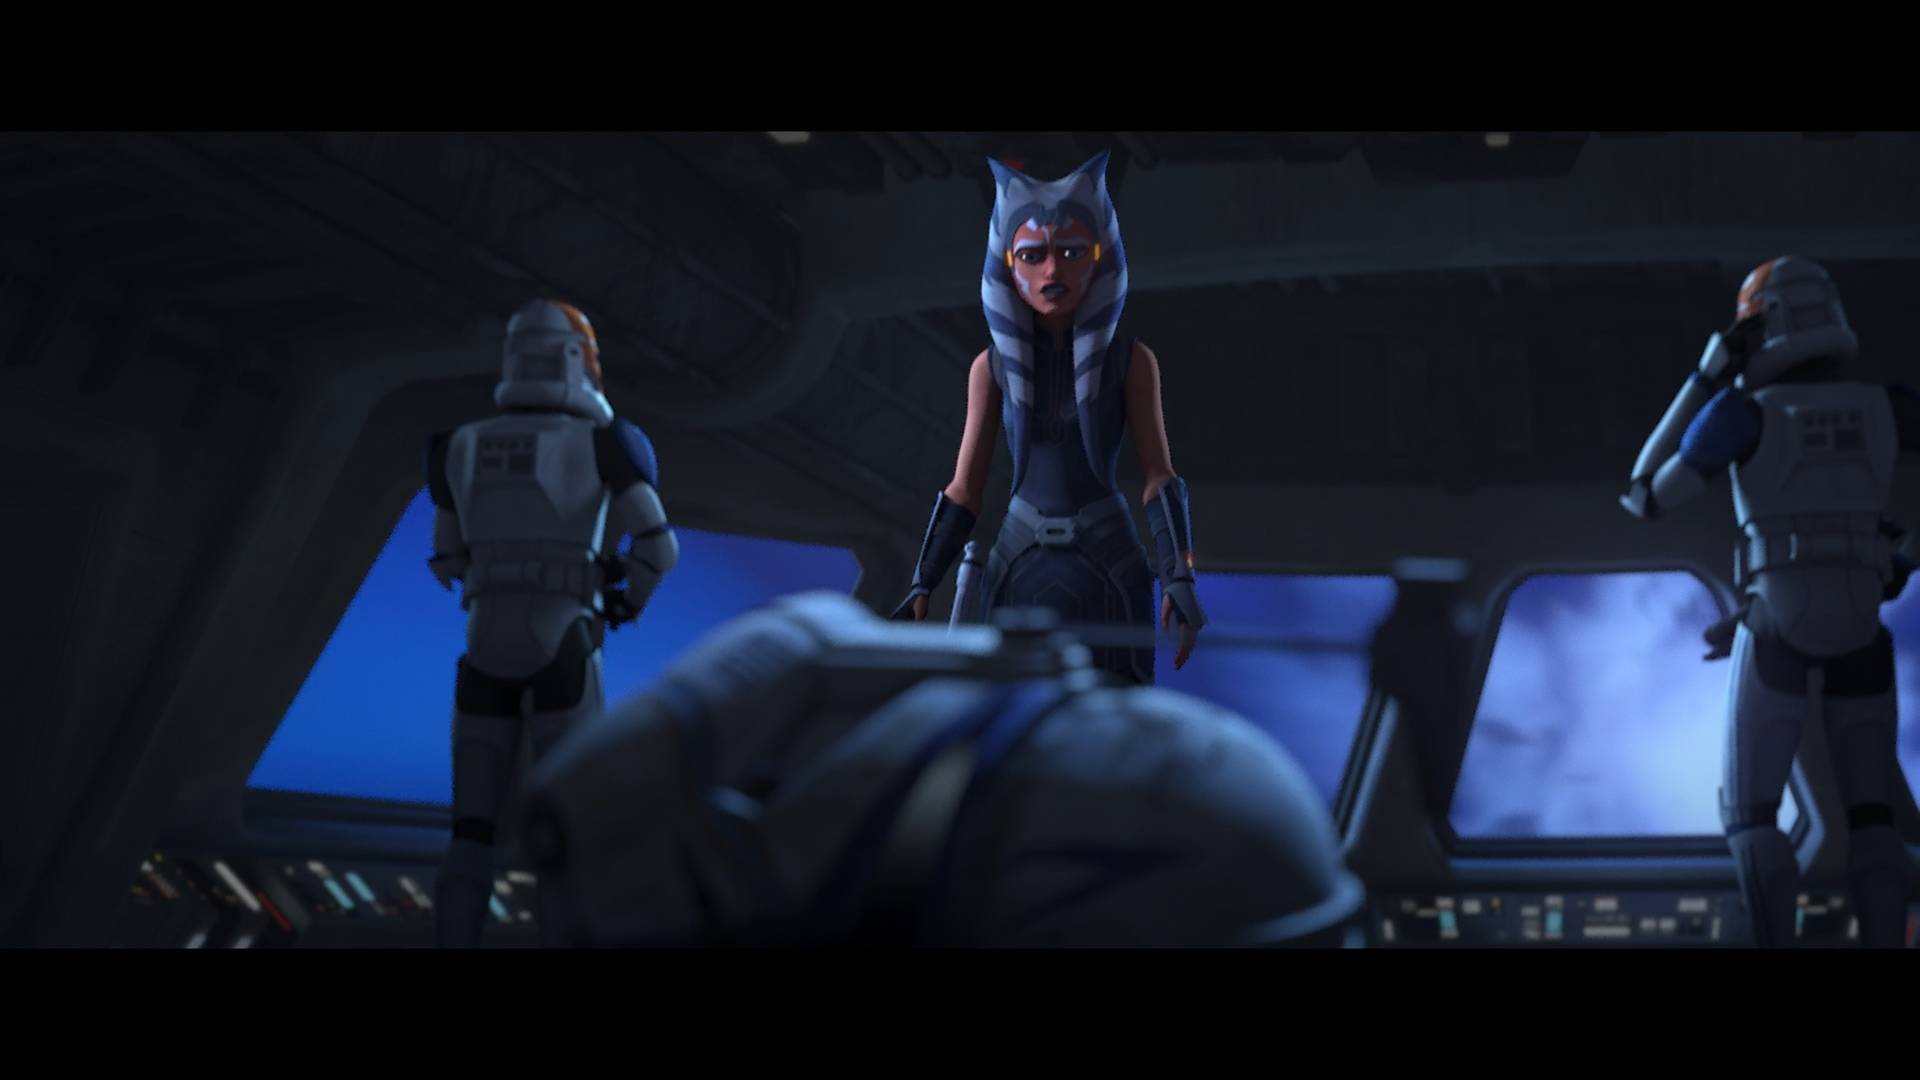 Rex Drops His Helmet Clone Wars S7 In 2020 Star Wars Clone Wars Star Wars Fandom Clone Wars